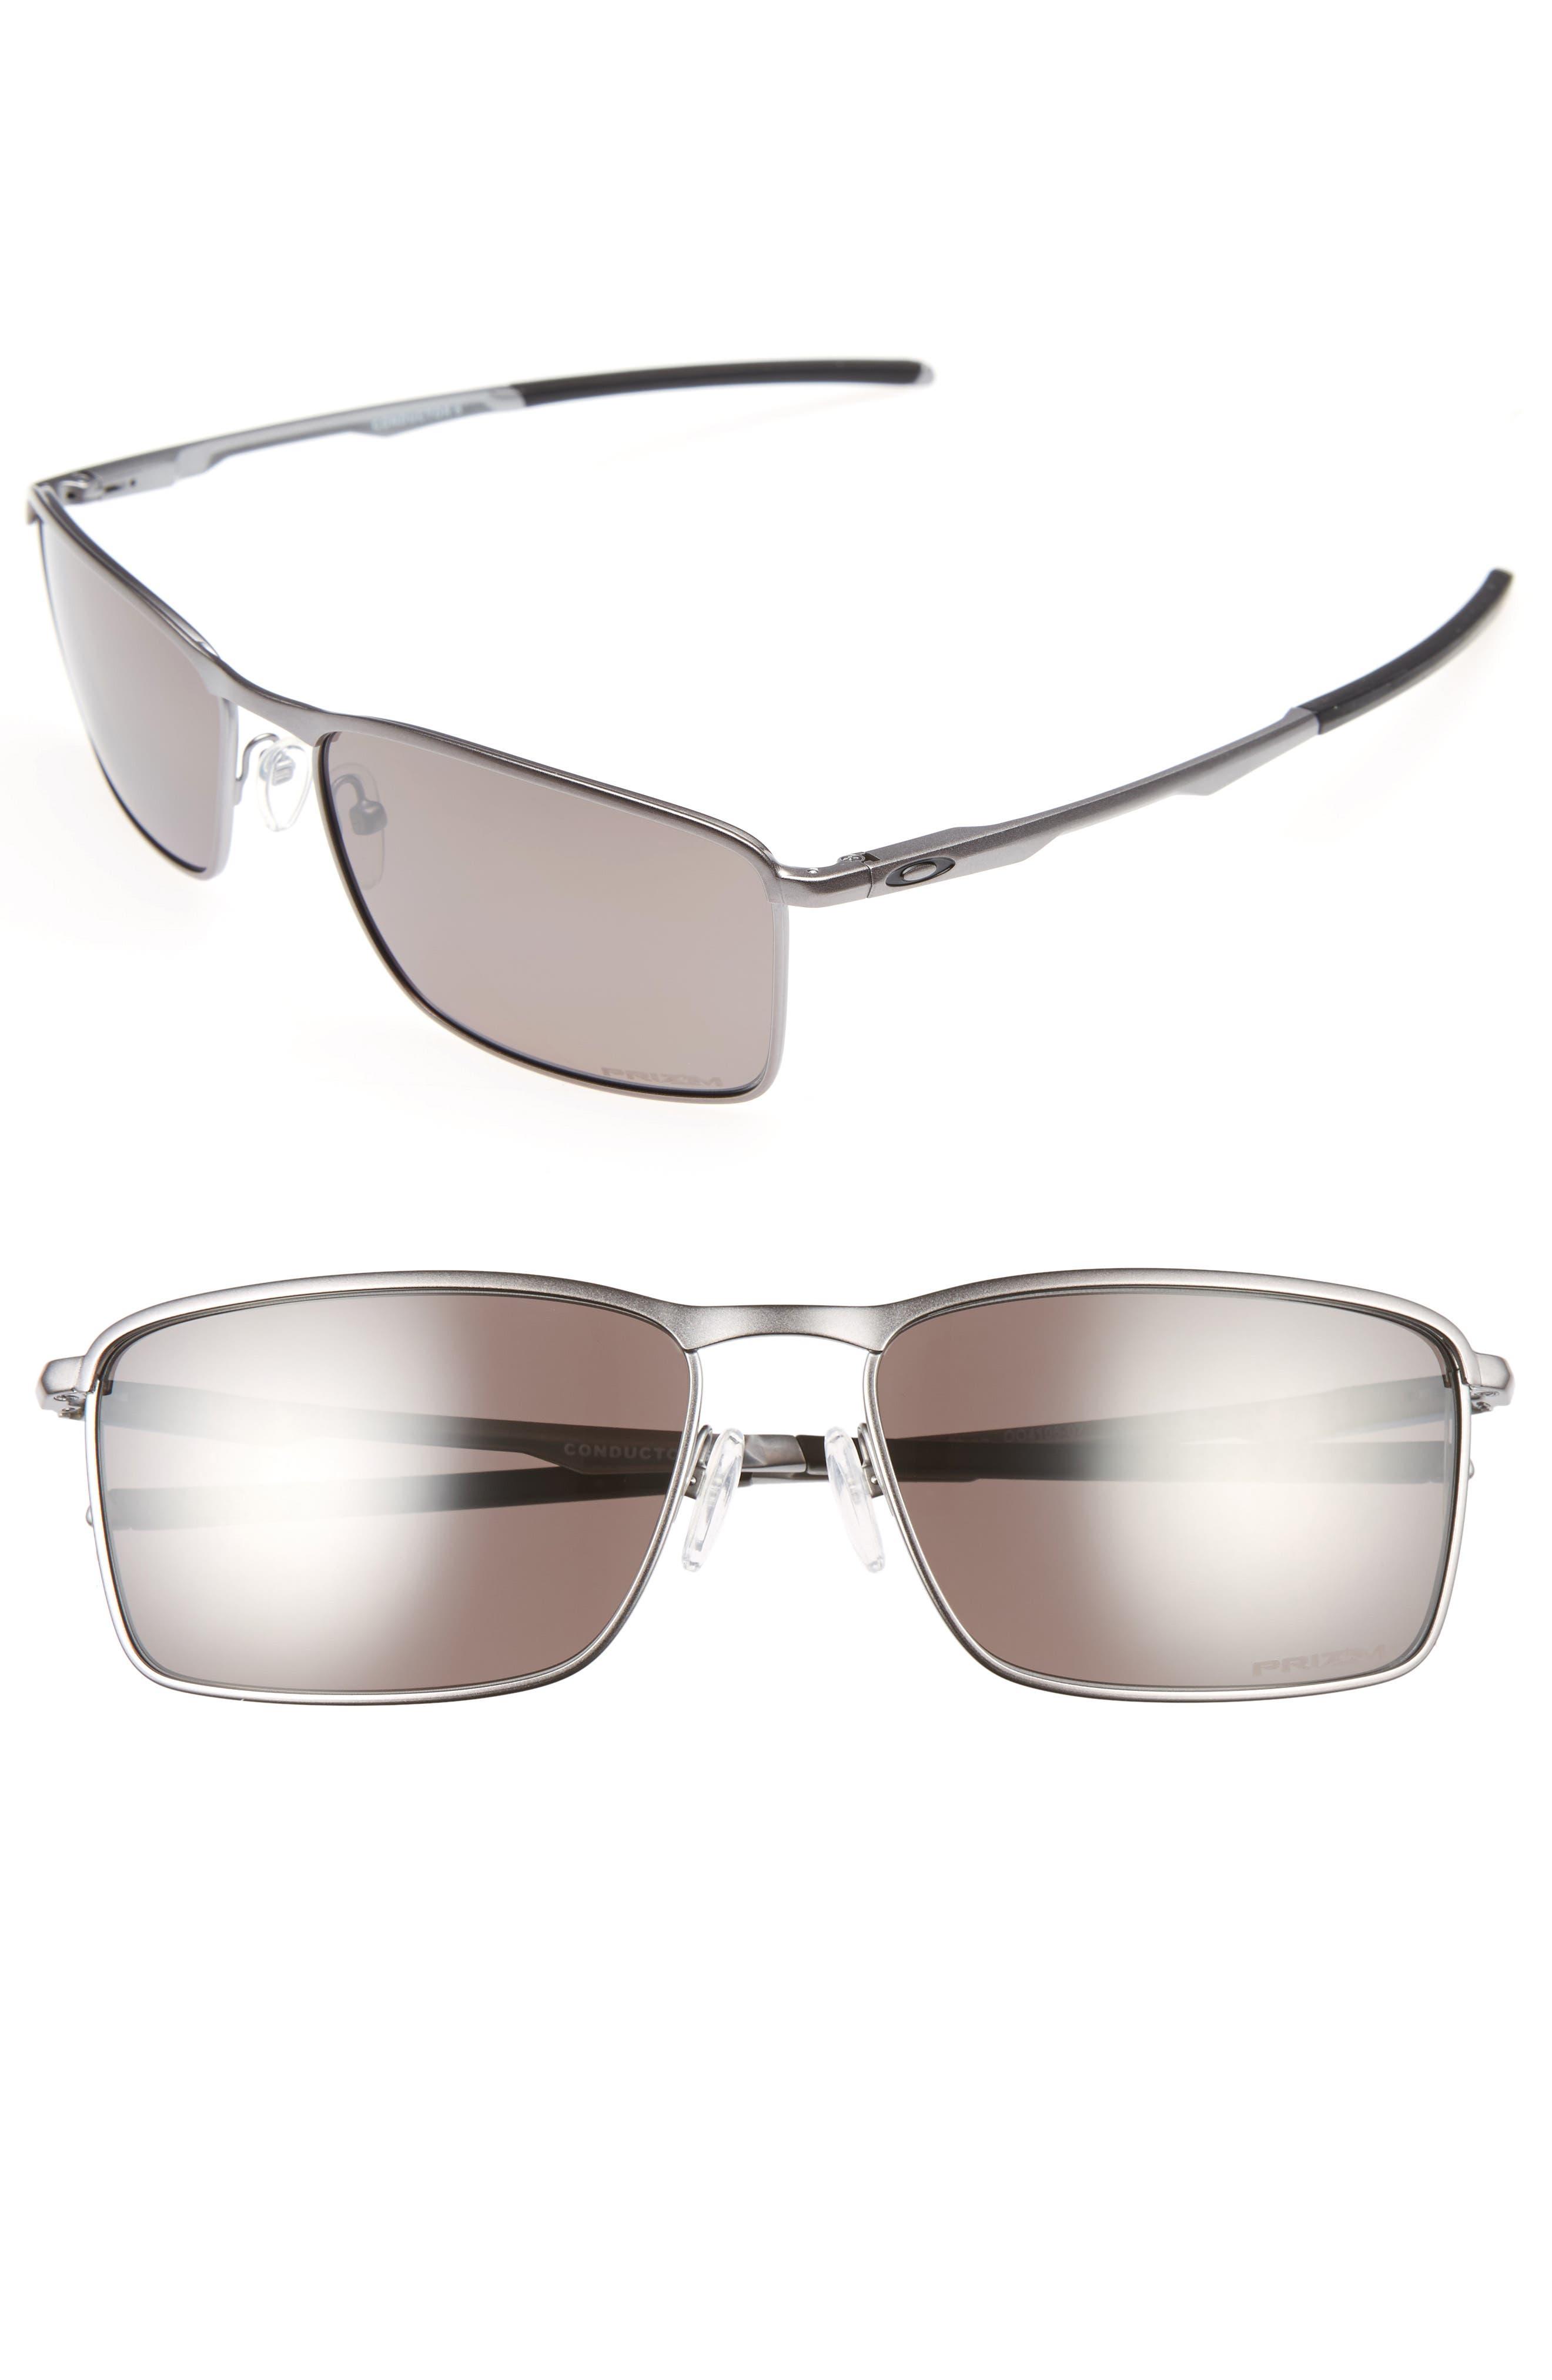 Conductor 6 58mm Polarized Sunglasses,                         Main,                         color, GREY